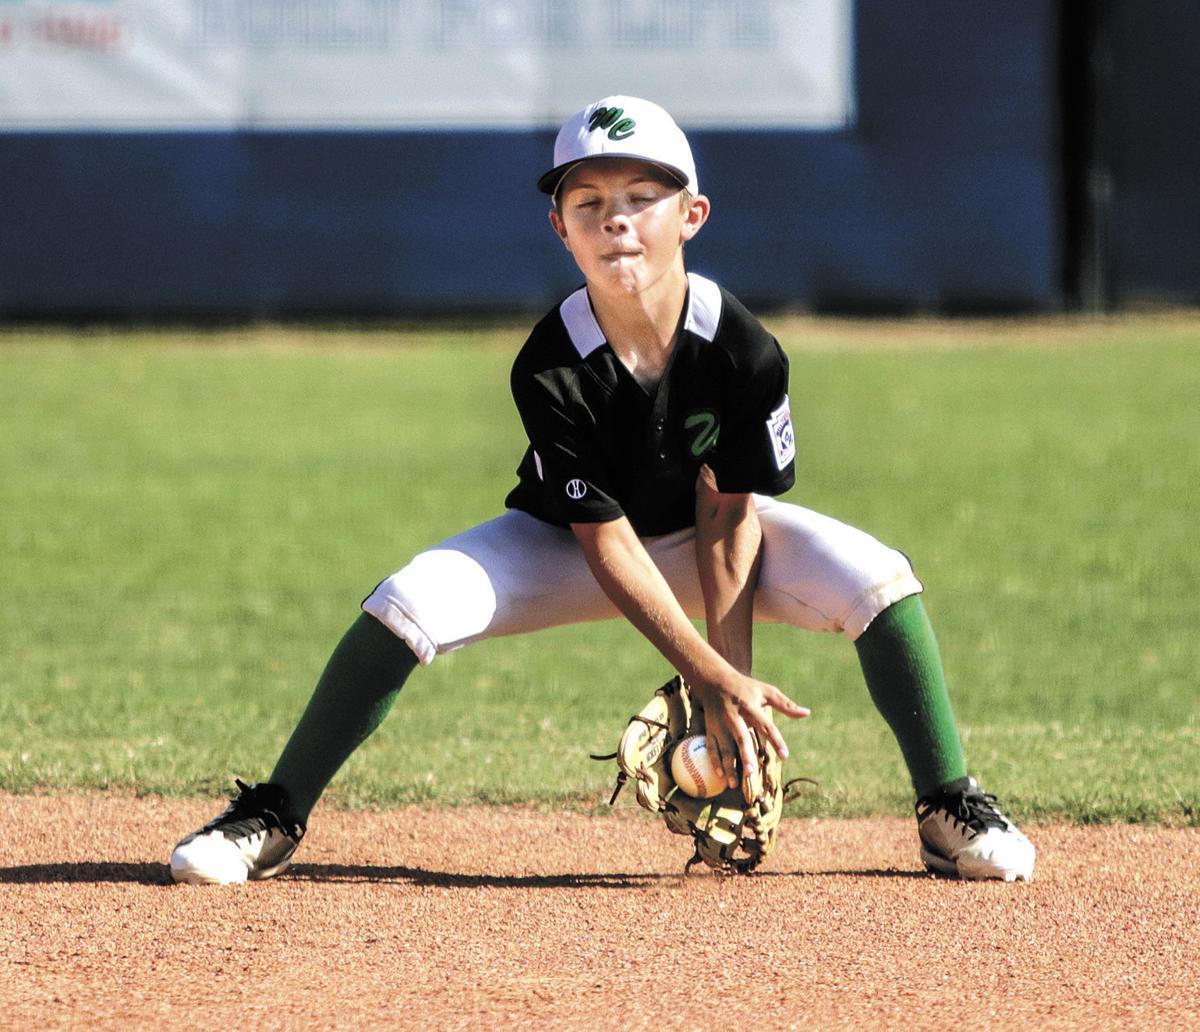 Washington County Little League's Brycen Carnagey